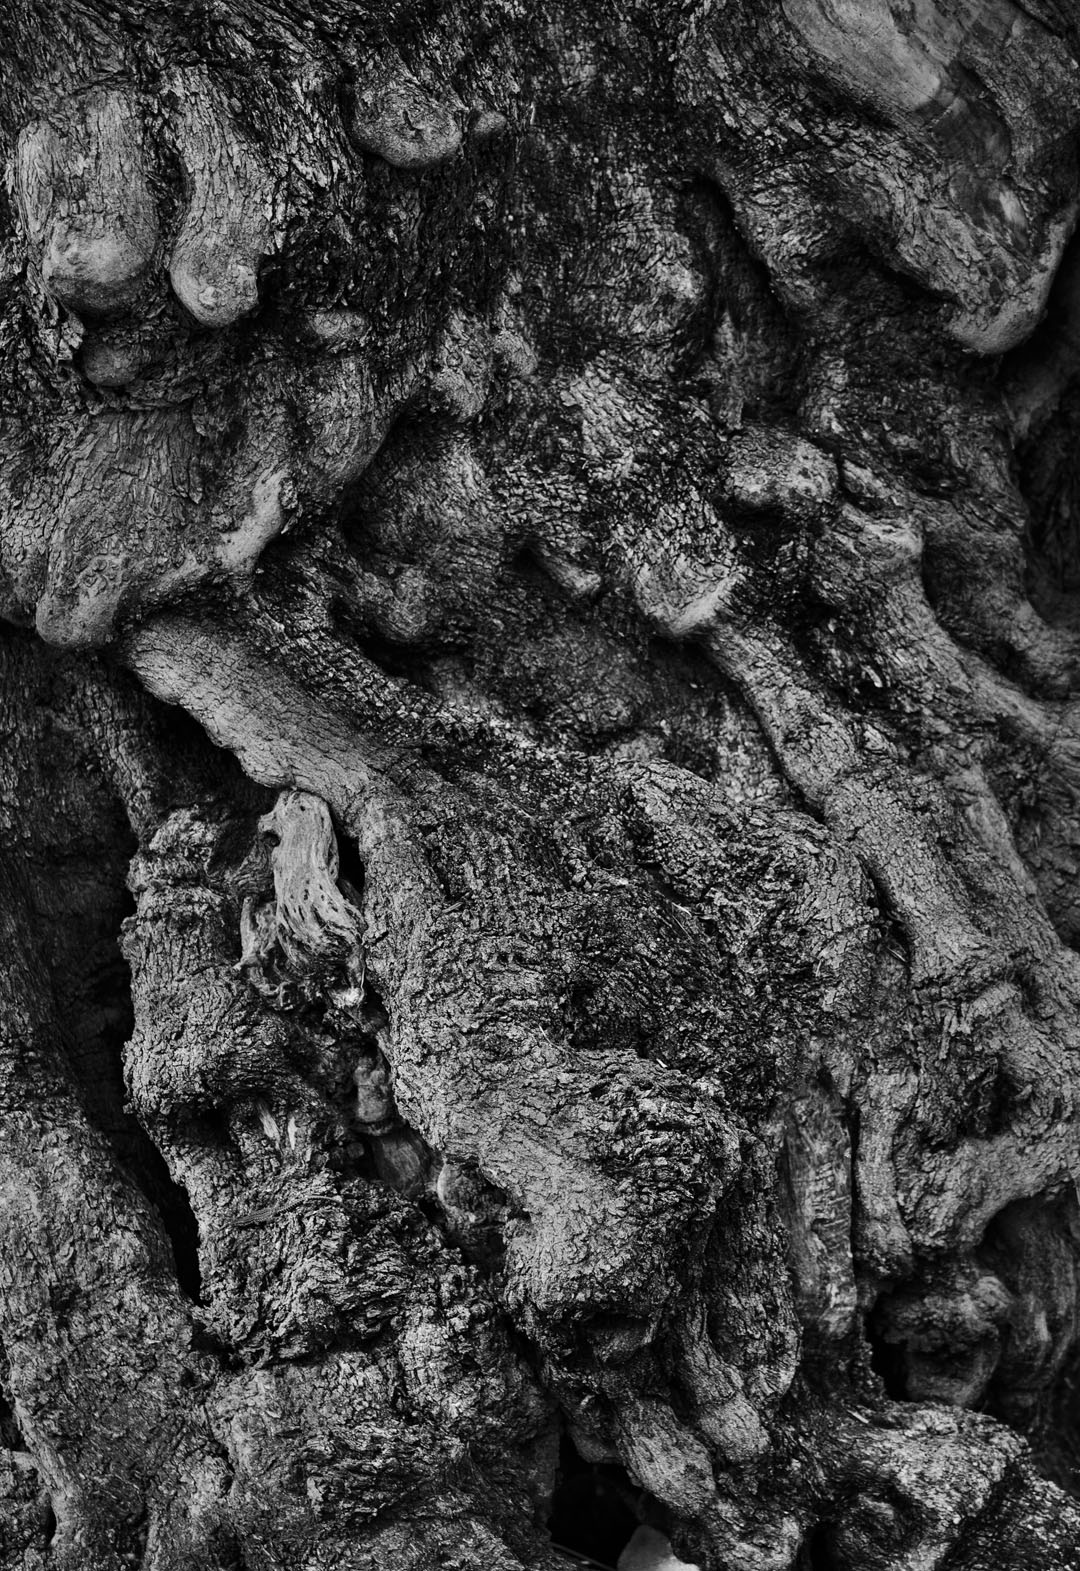 Millenial Rhizome (An Olive Tree in Puglia)